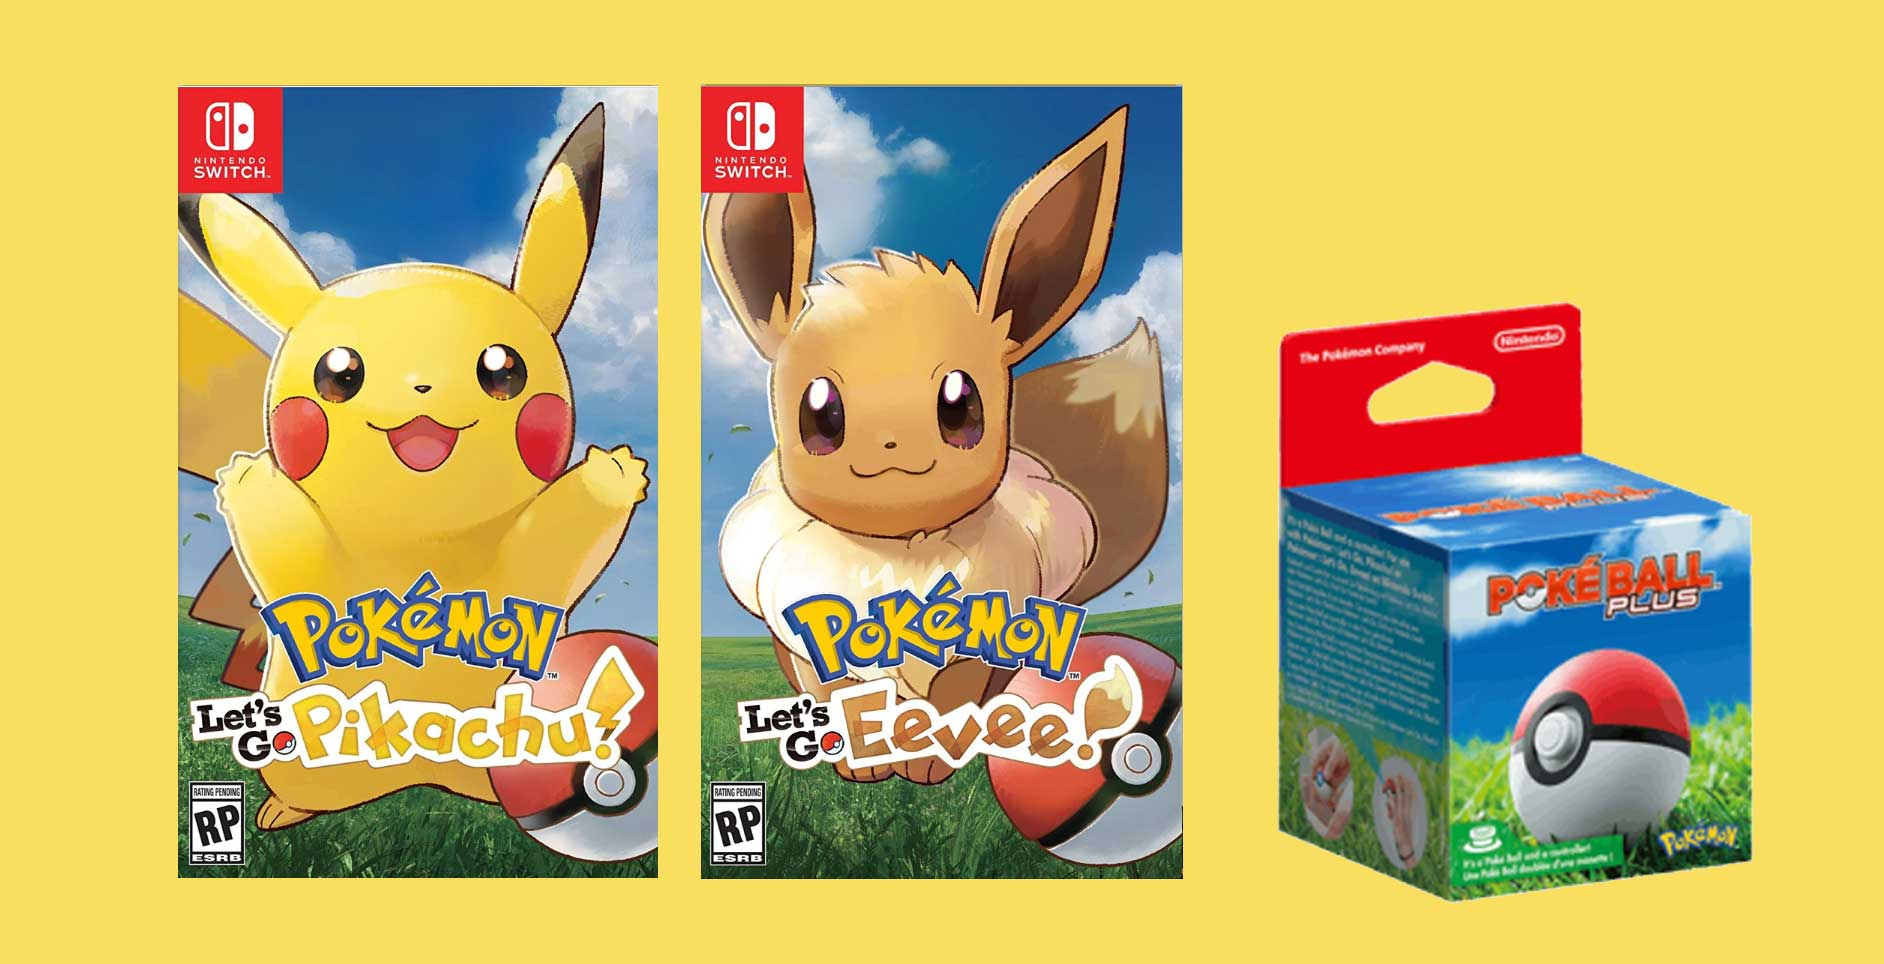 pokemon-plus-olivec.jpg (145.7 Kb)